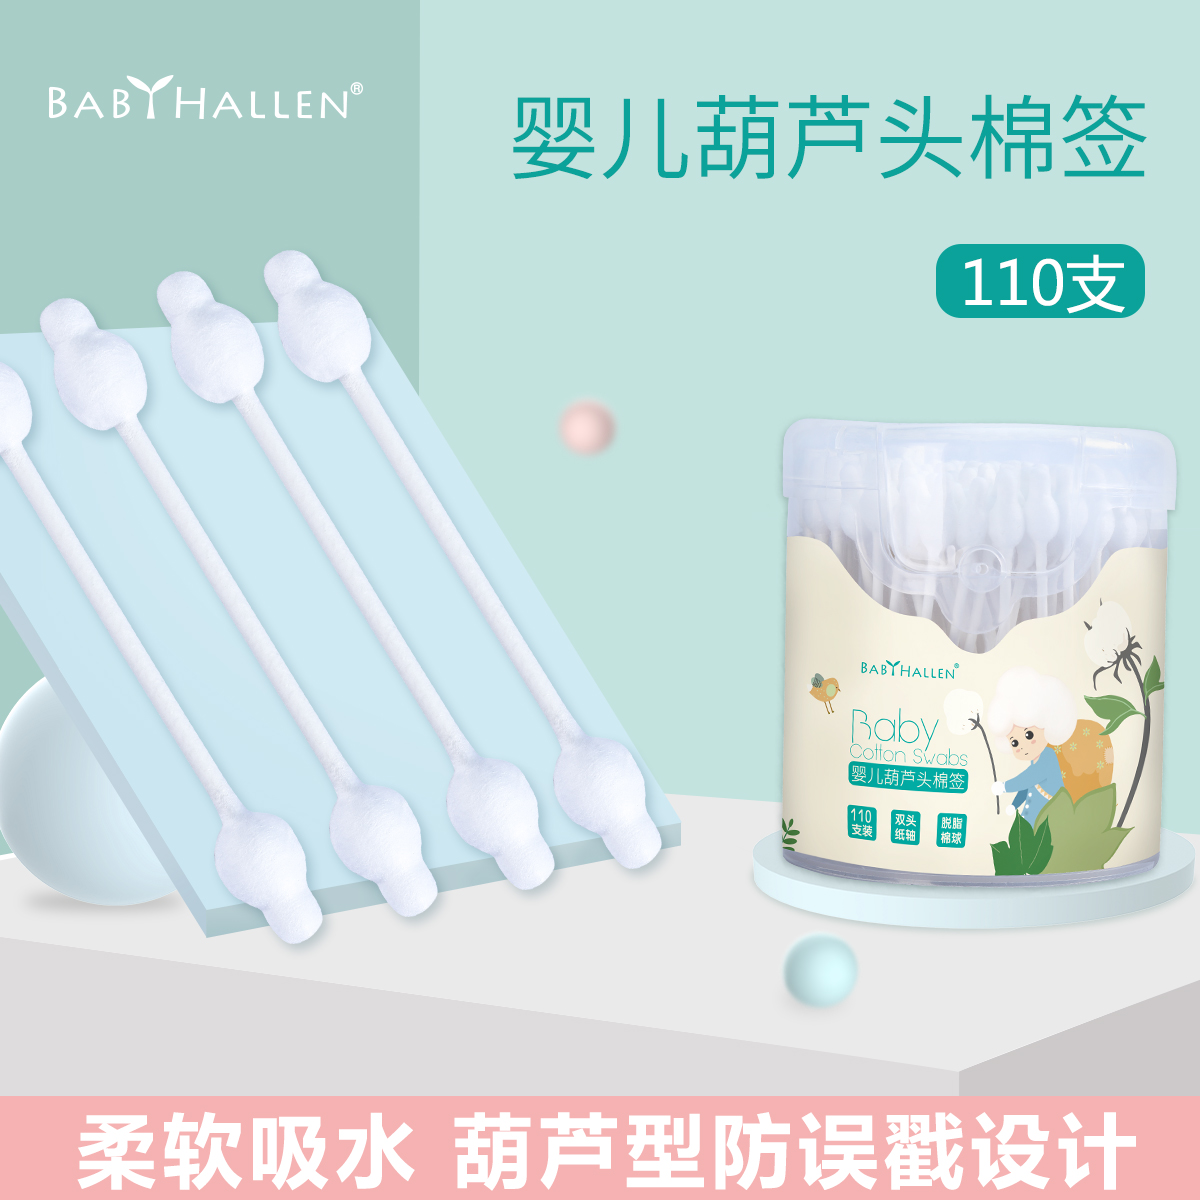 BabyHallen婴儿棉签宝宝专用葫芦头棉花棒新生儿耳鼻儿童超细棉签